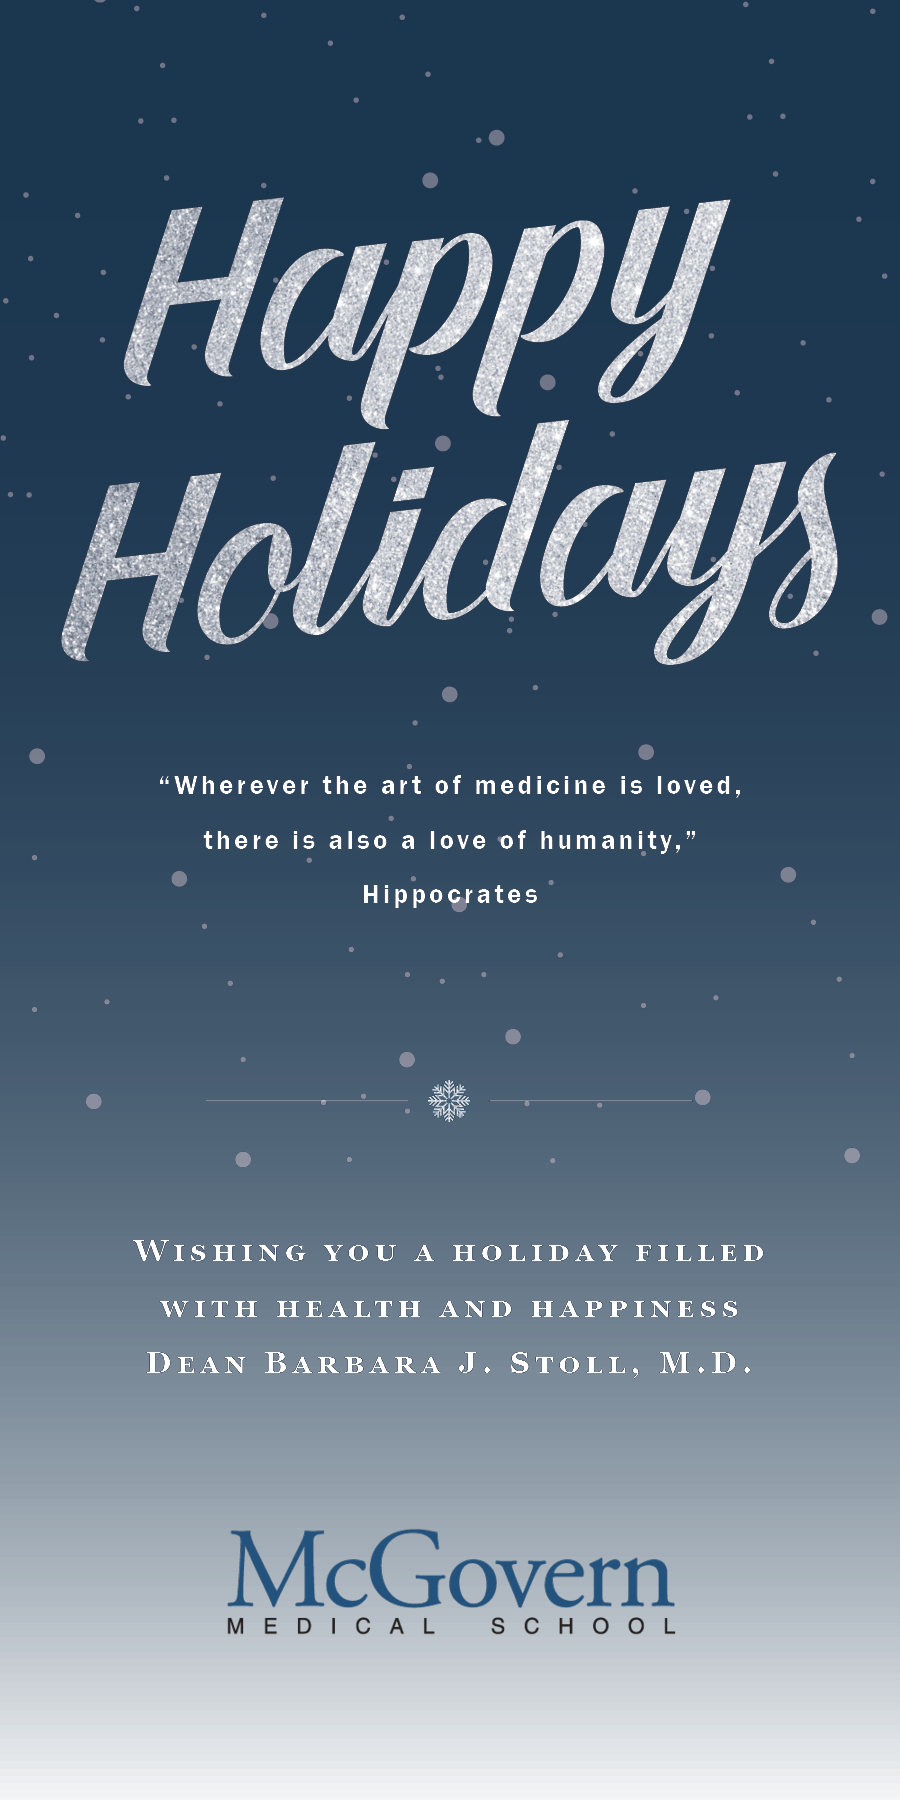 holiday_card2016_deanStollFinal_vertical.jpg